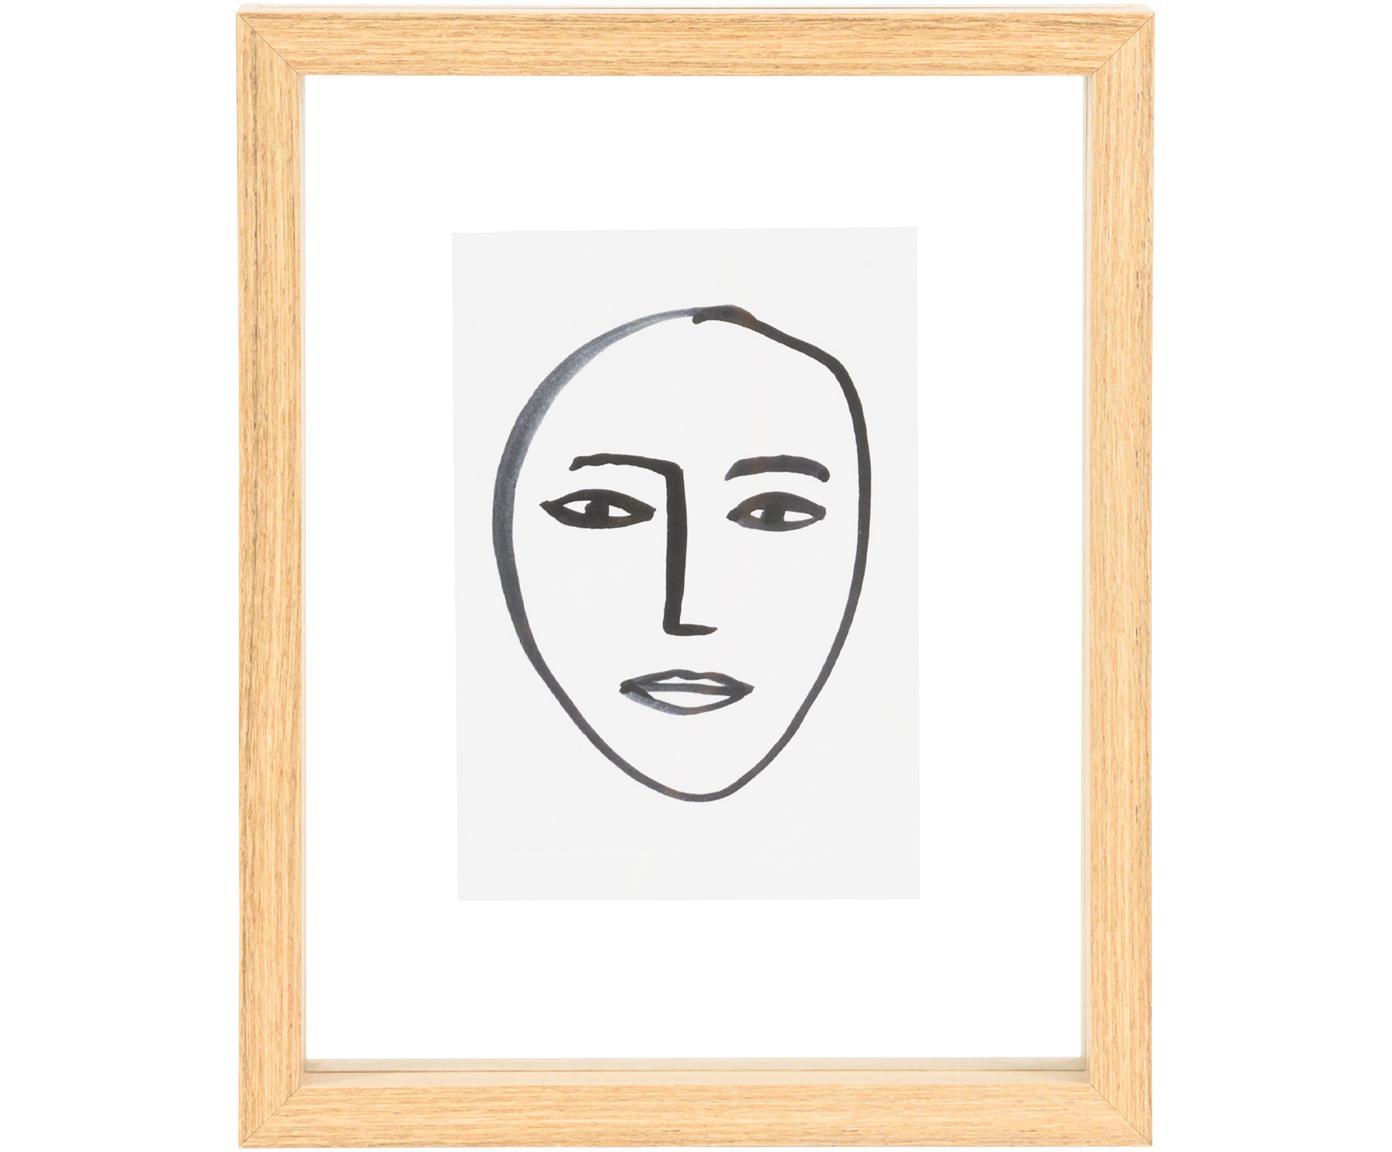 Bilderrahmen Aesthetic, Rahmen: Mitteldichte Holzfaserpla, Braun, 10 x 15 cm